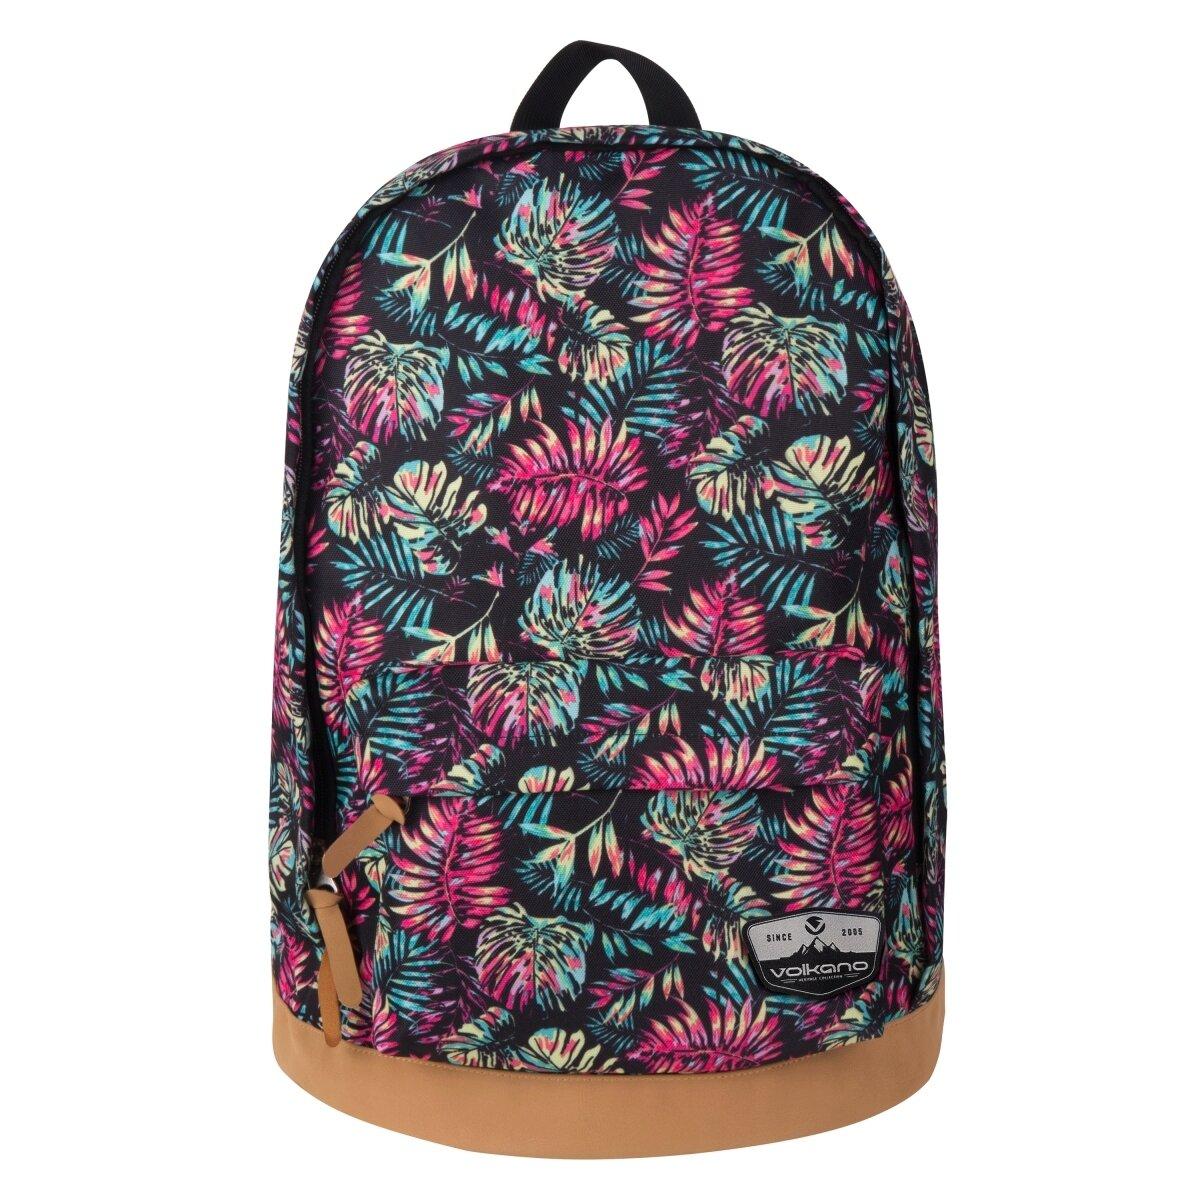 Volkano Suede Series Backpack Multi Jungle